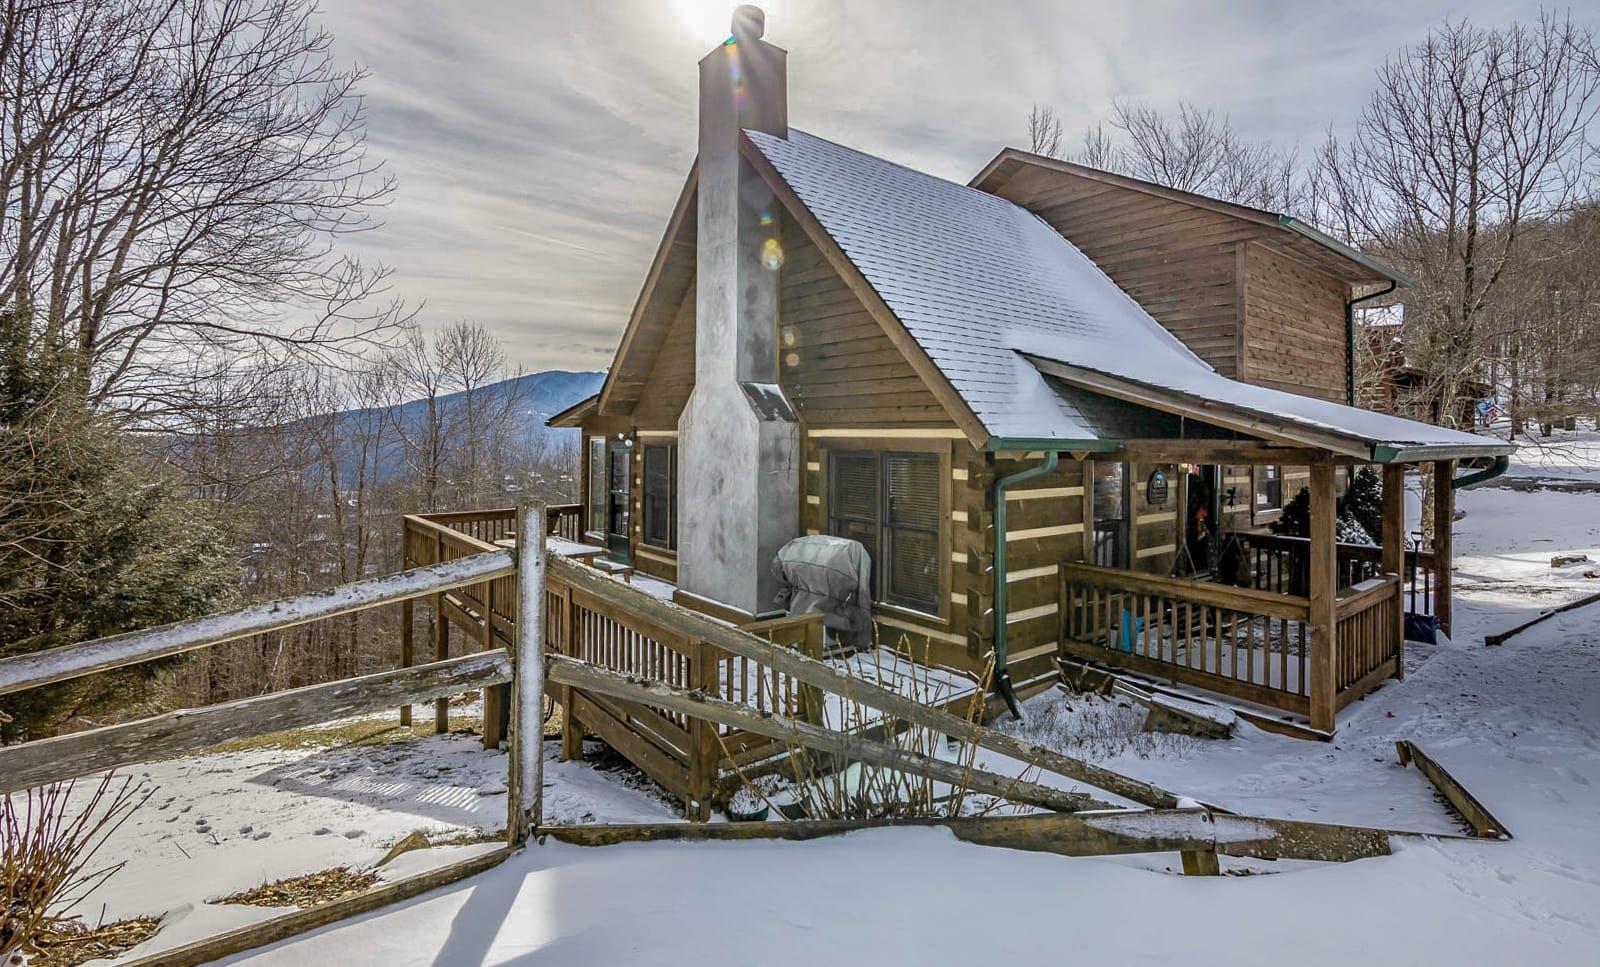 Carolina Cabin Rentals Mountain Memories In Boone Banner Elk Nc Cabin Rentals Cabin Hot Tub Outdoor